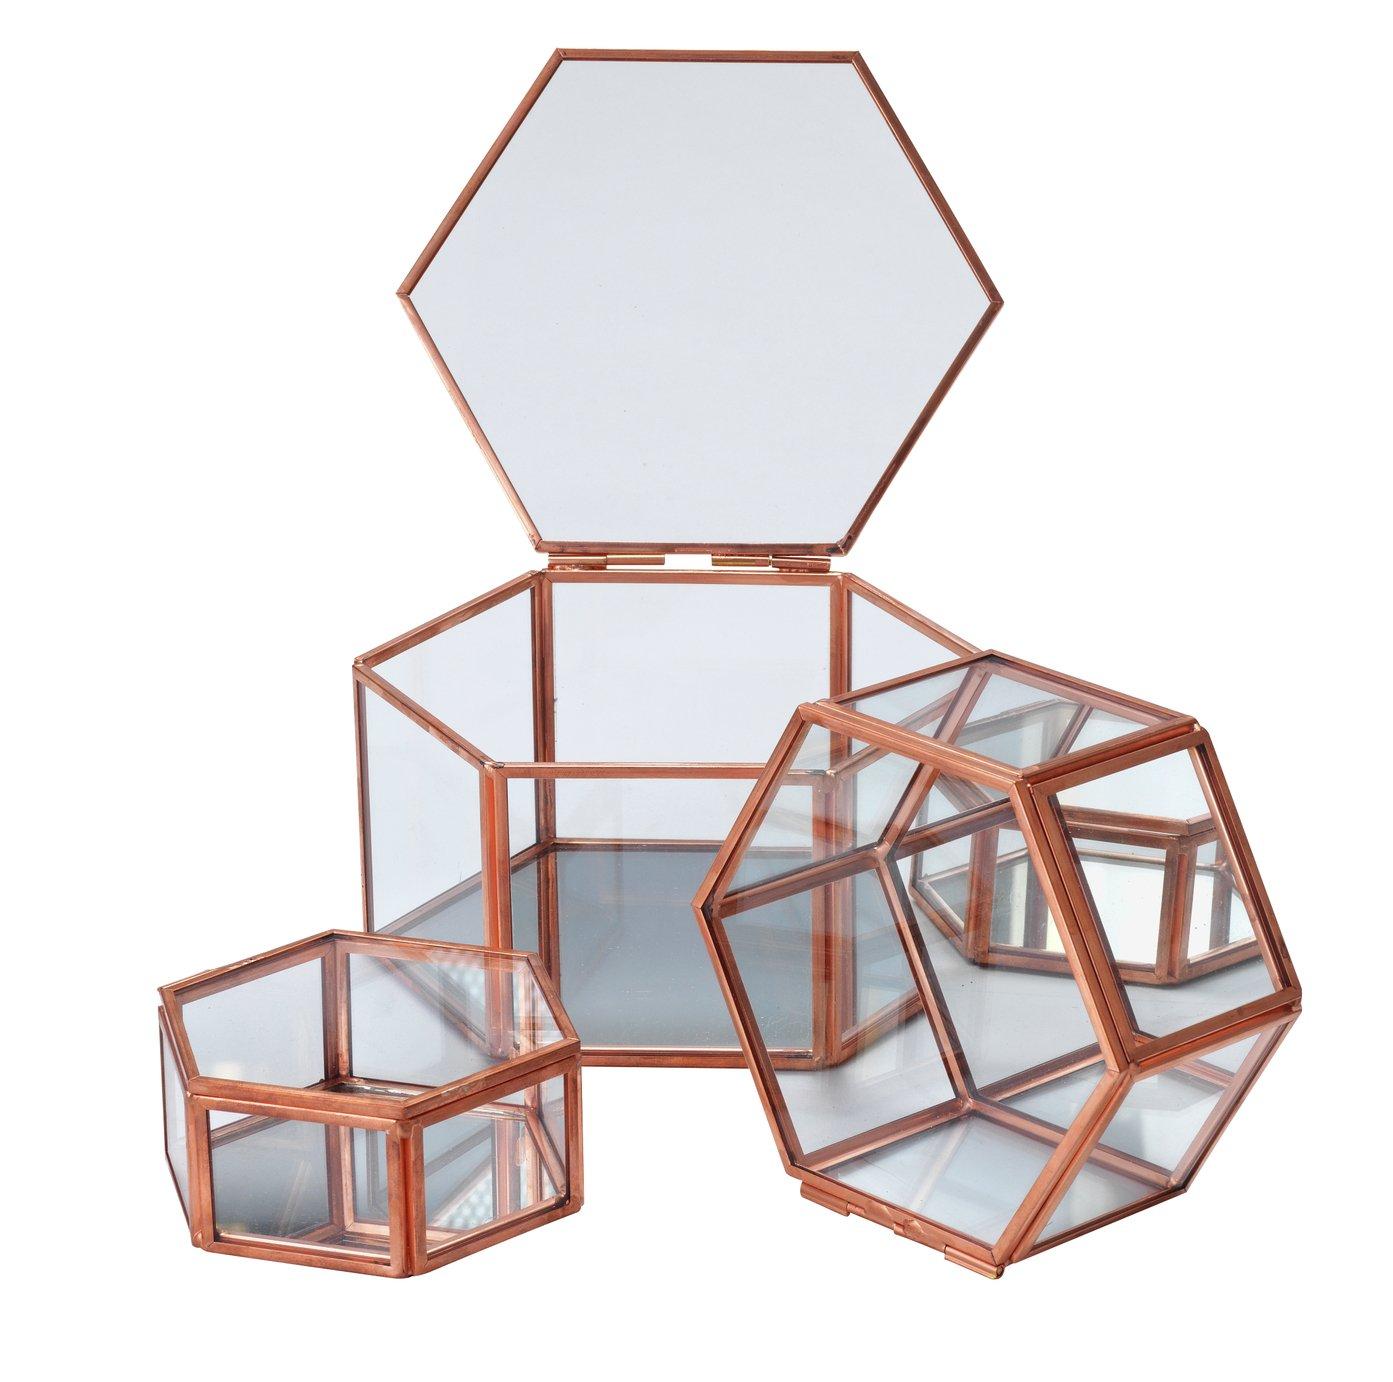 Rose Gold Edged Glass Trinket Boxes -  Set of 3